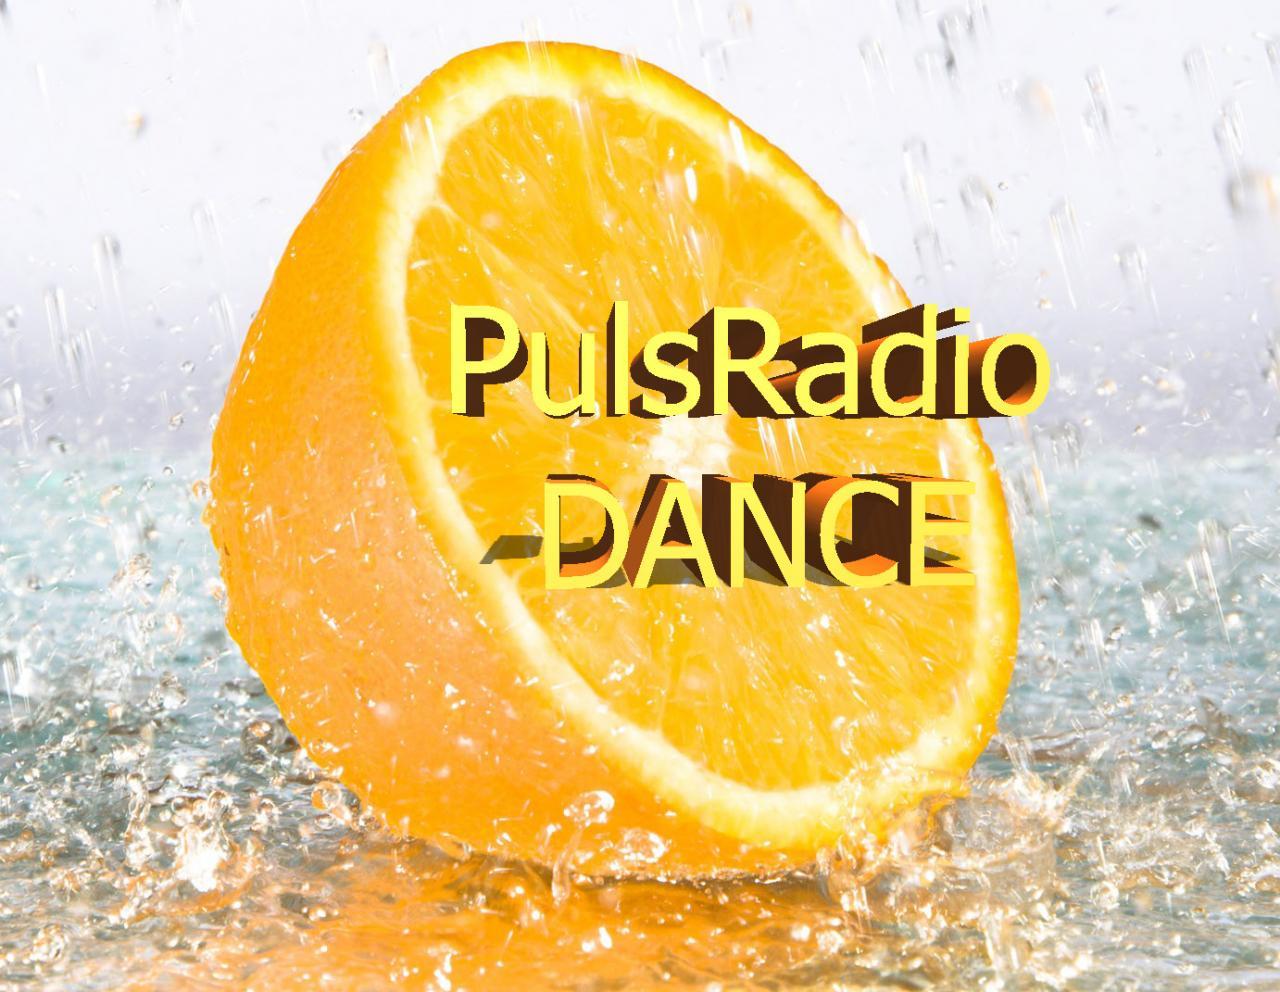 Pulsradio Dance